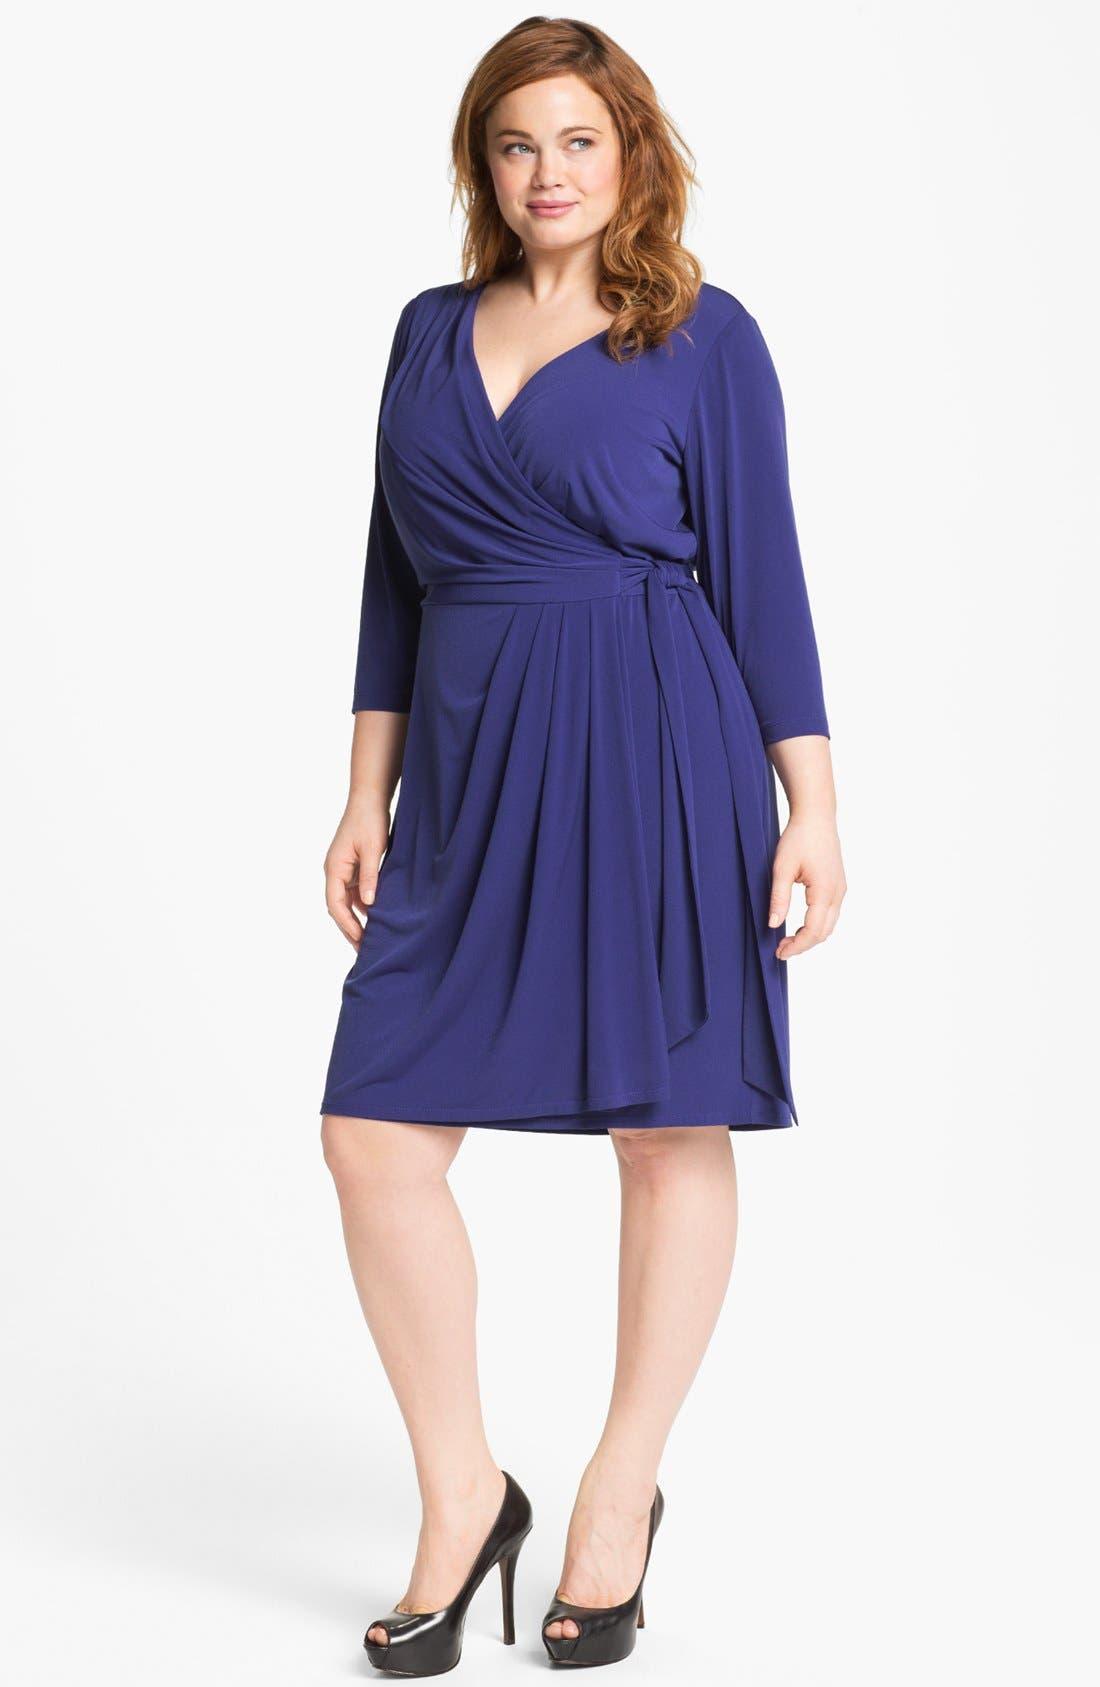 Main Image - Suzi Chin for Maggy Boutique Jersey Faux Wrap Dress (Plus Size)